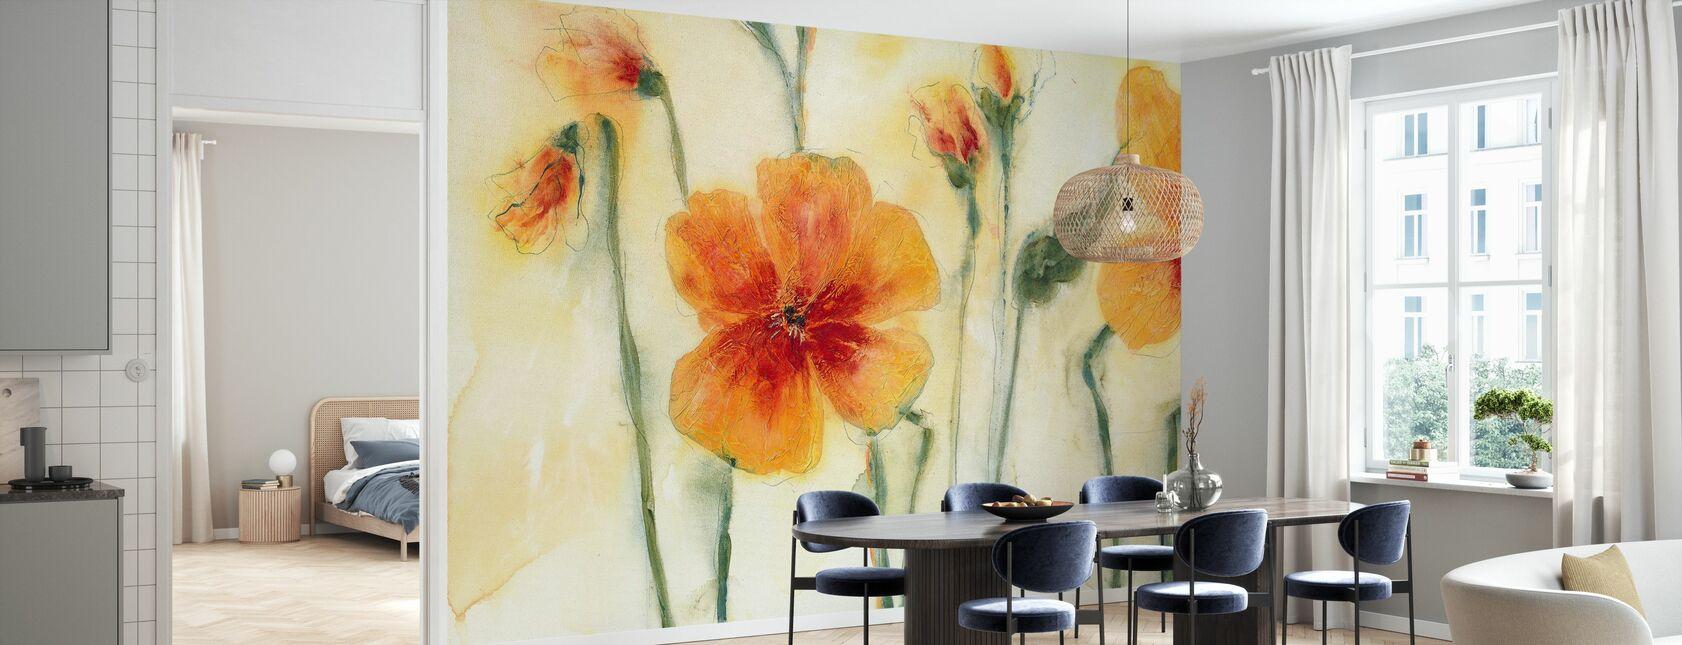 Orange Thoughts - Wallpaper - Kitchen